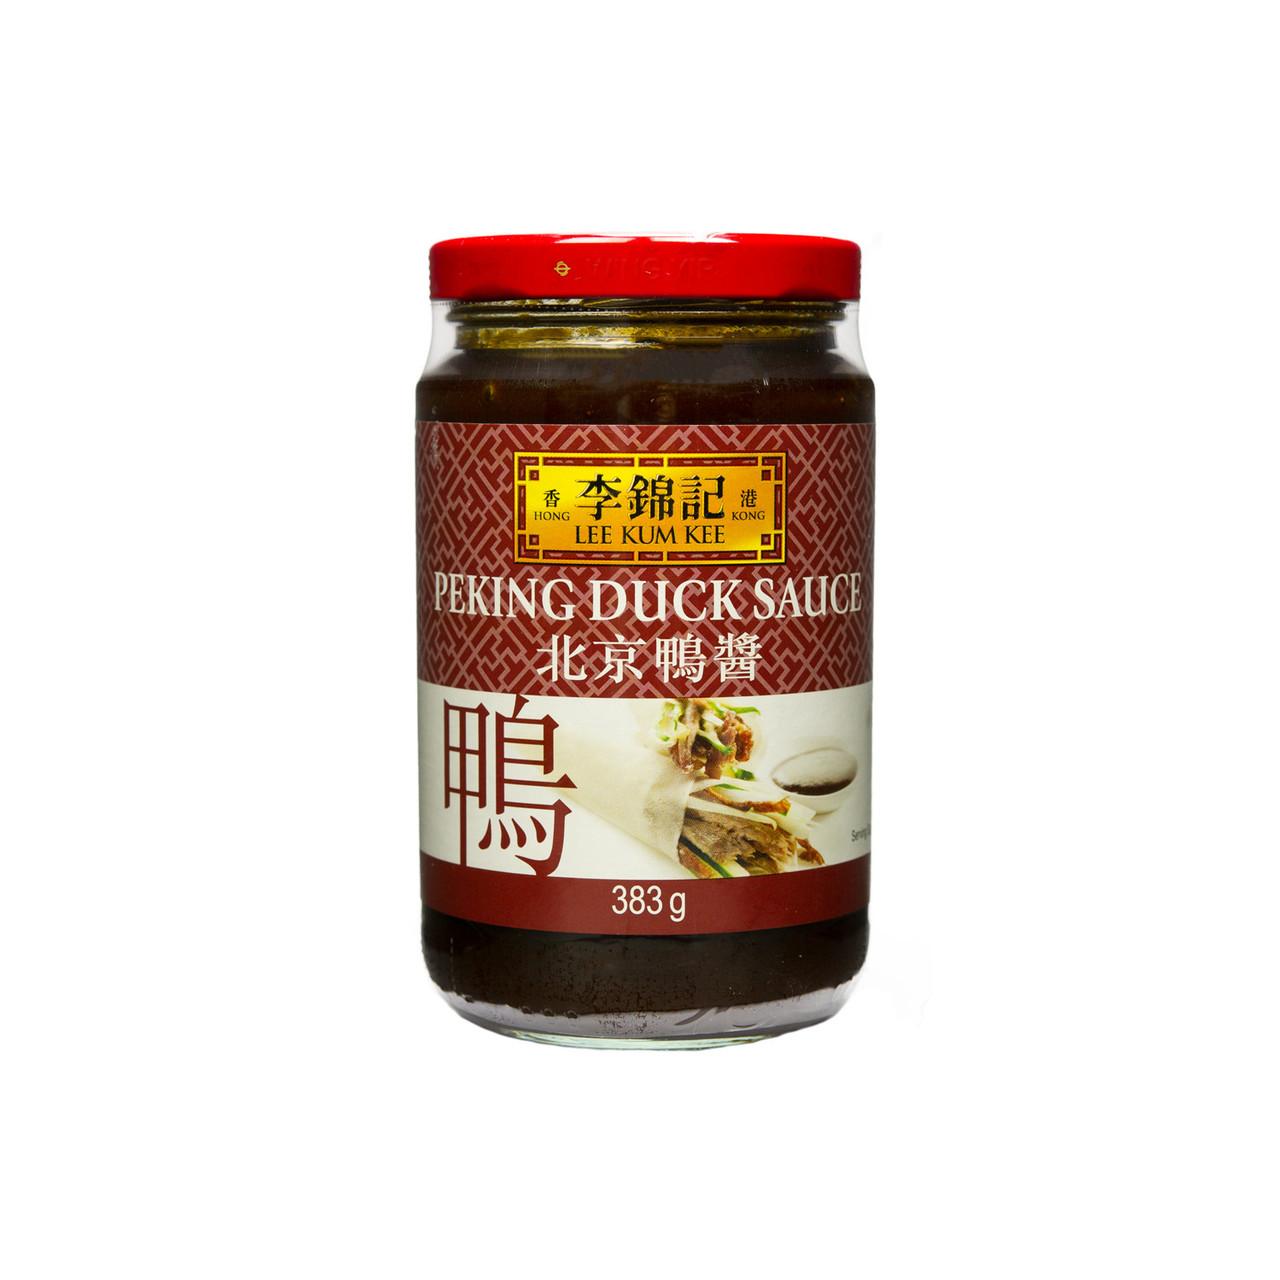 PEKING DUCK SAUCE LEE KUM KEE 383g